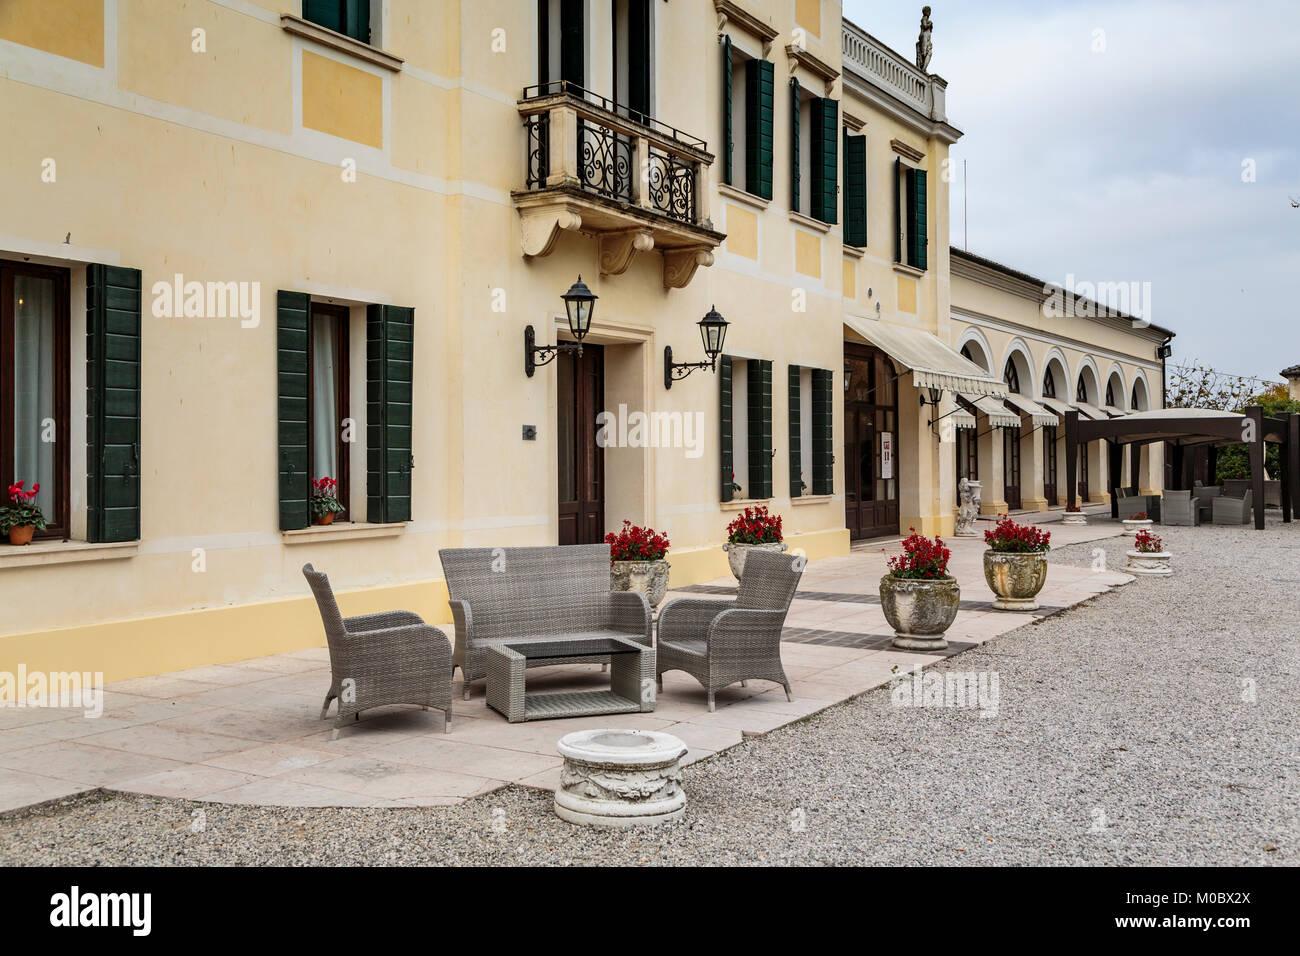 El hotel Villa Braida Mogliano Veneto, Venecia, Italia, Europa. Imagen De Stock